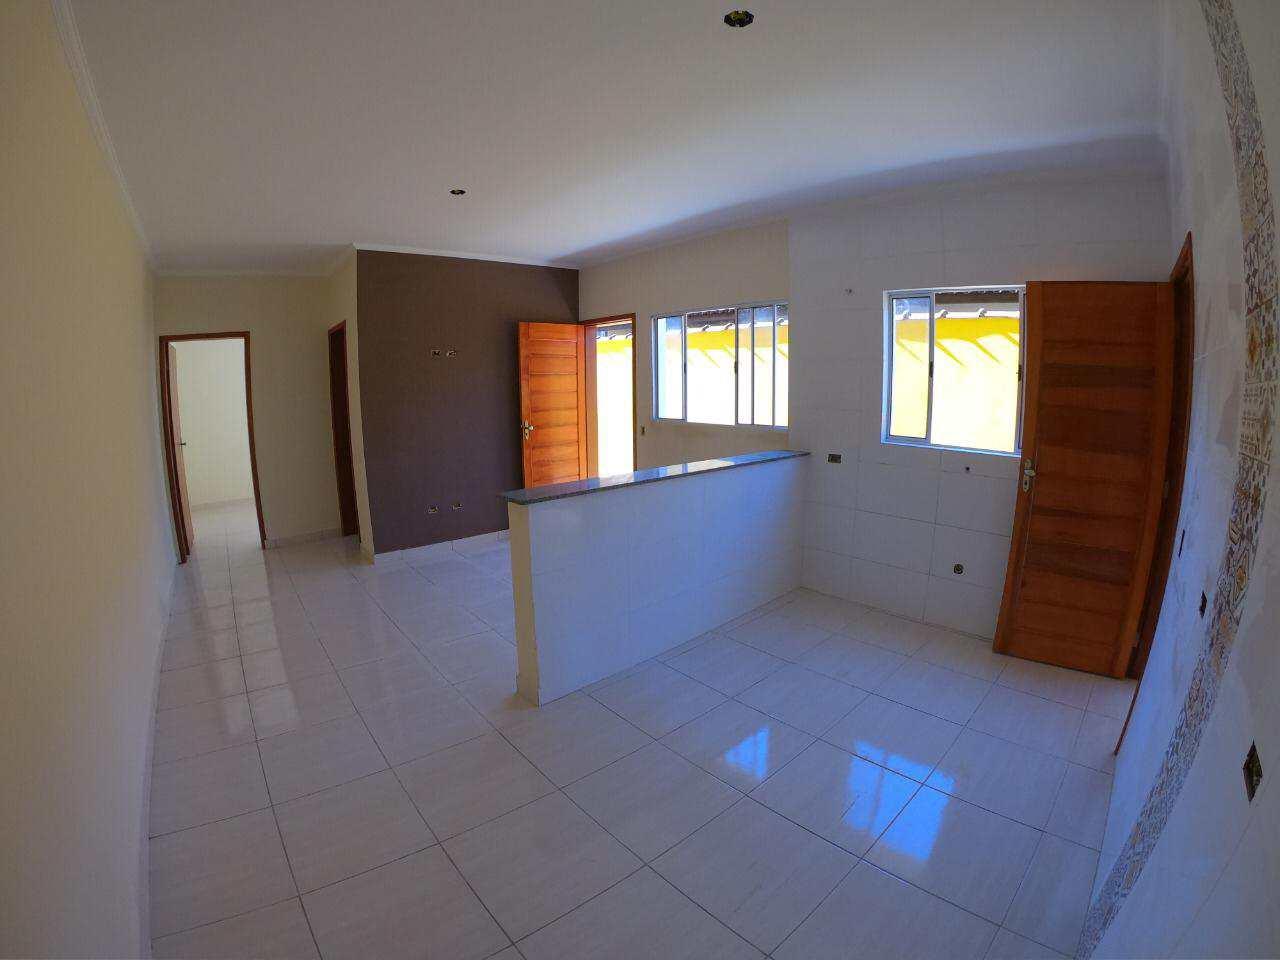 Casa com 3 dorms, Loty, Itanhaém - R$ 197 mil, Cod: 279334